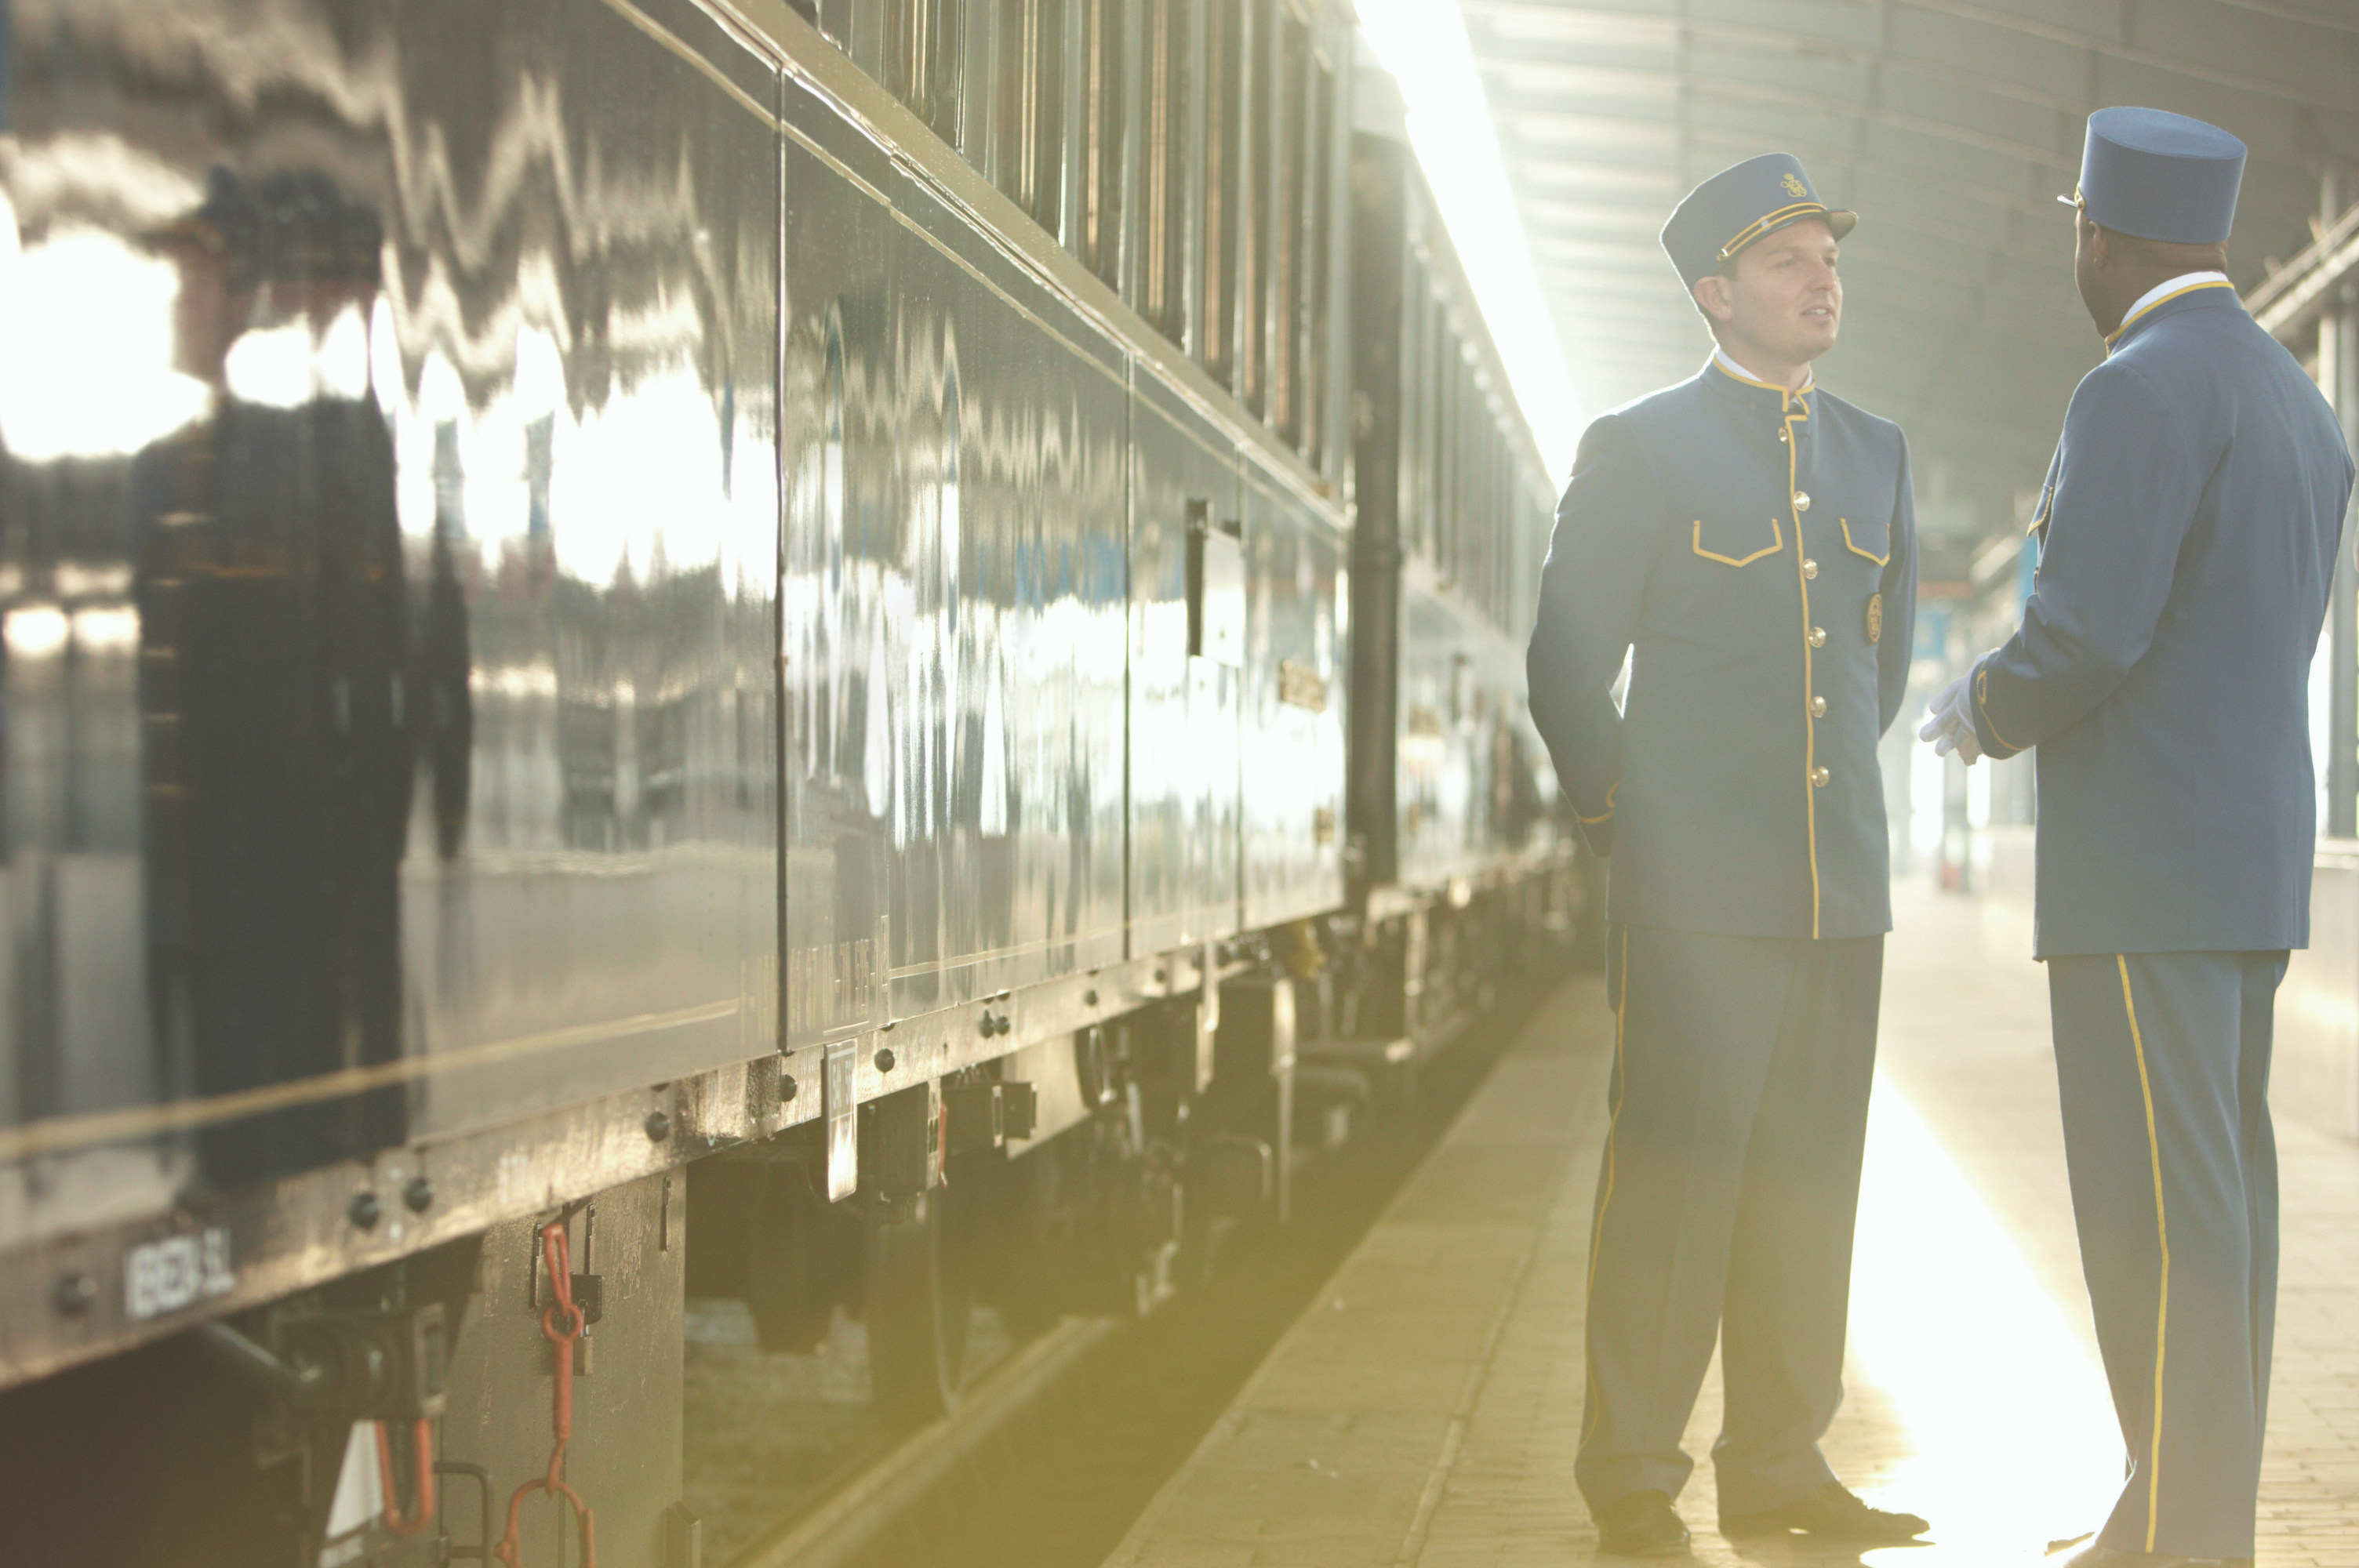 Venice Simplon Orient Express.